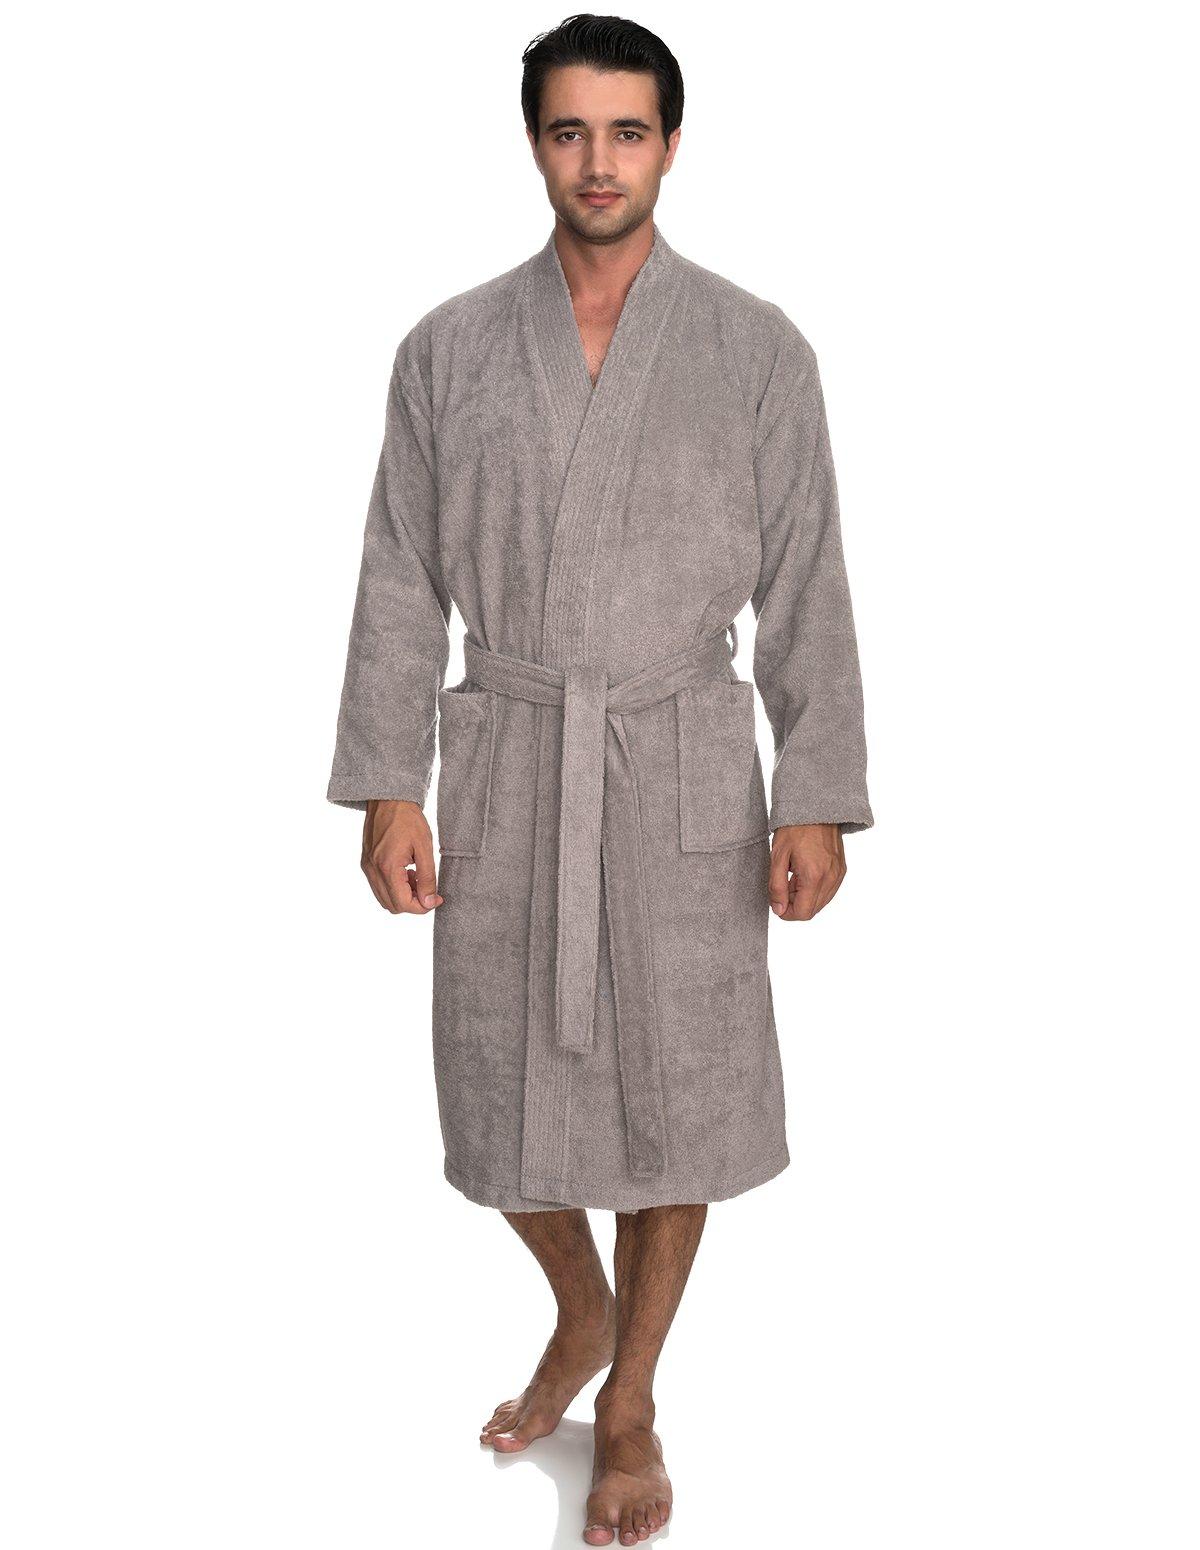 TowelSelections Men's Robe, Turkish Cotton Terry Kimono Bathrobe Large/X-Large Paloma Gray